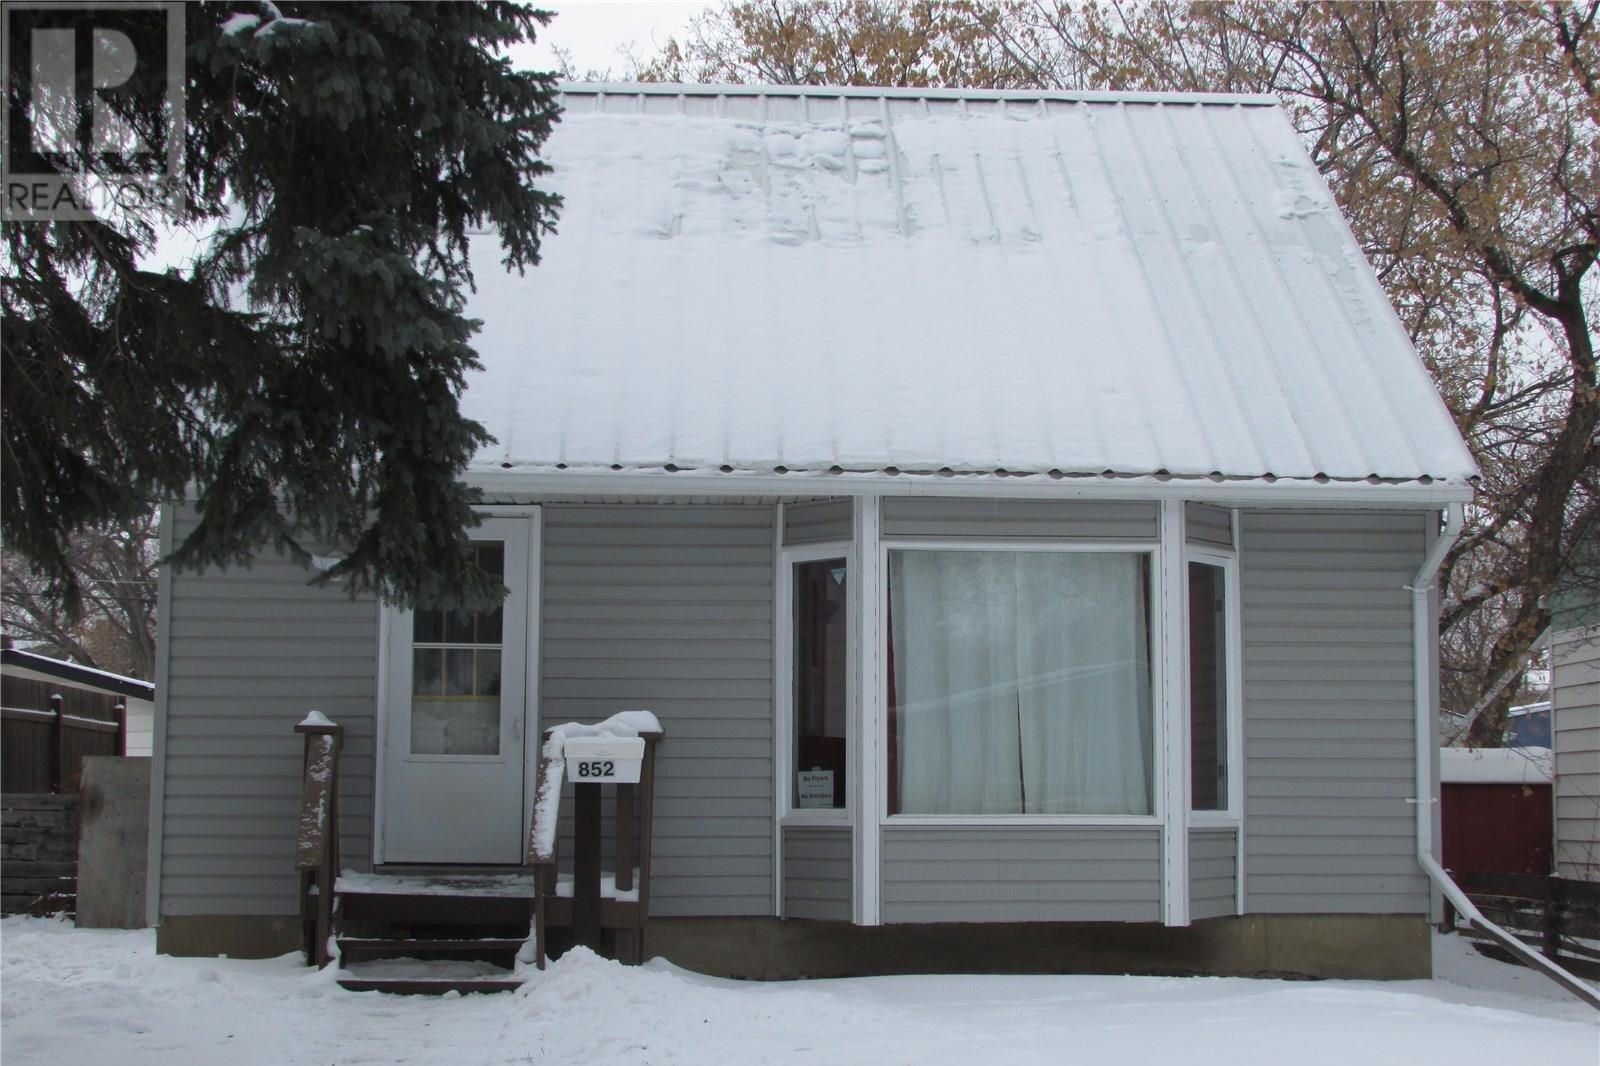 House for sale at 852 Queen St Regina Saskatchewan - MLS: SK833920